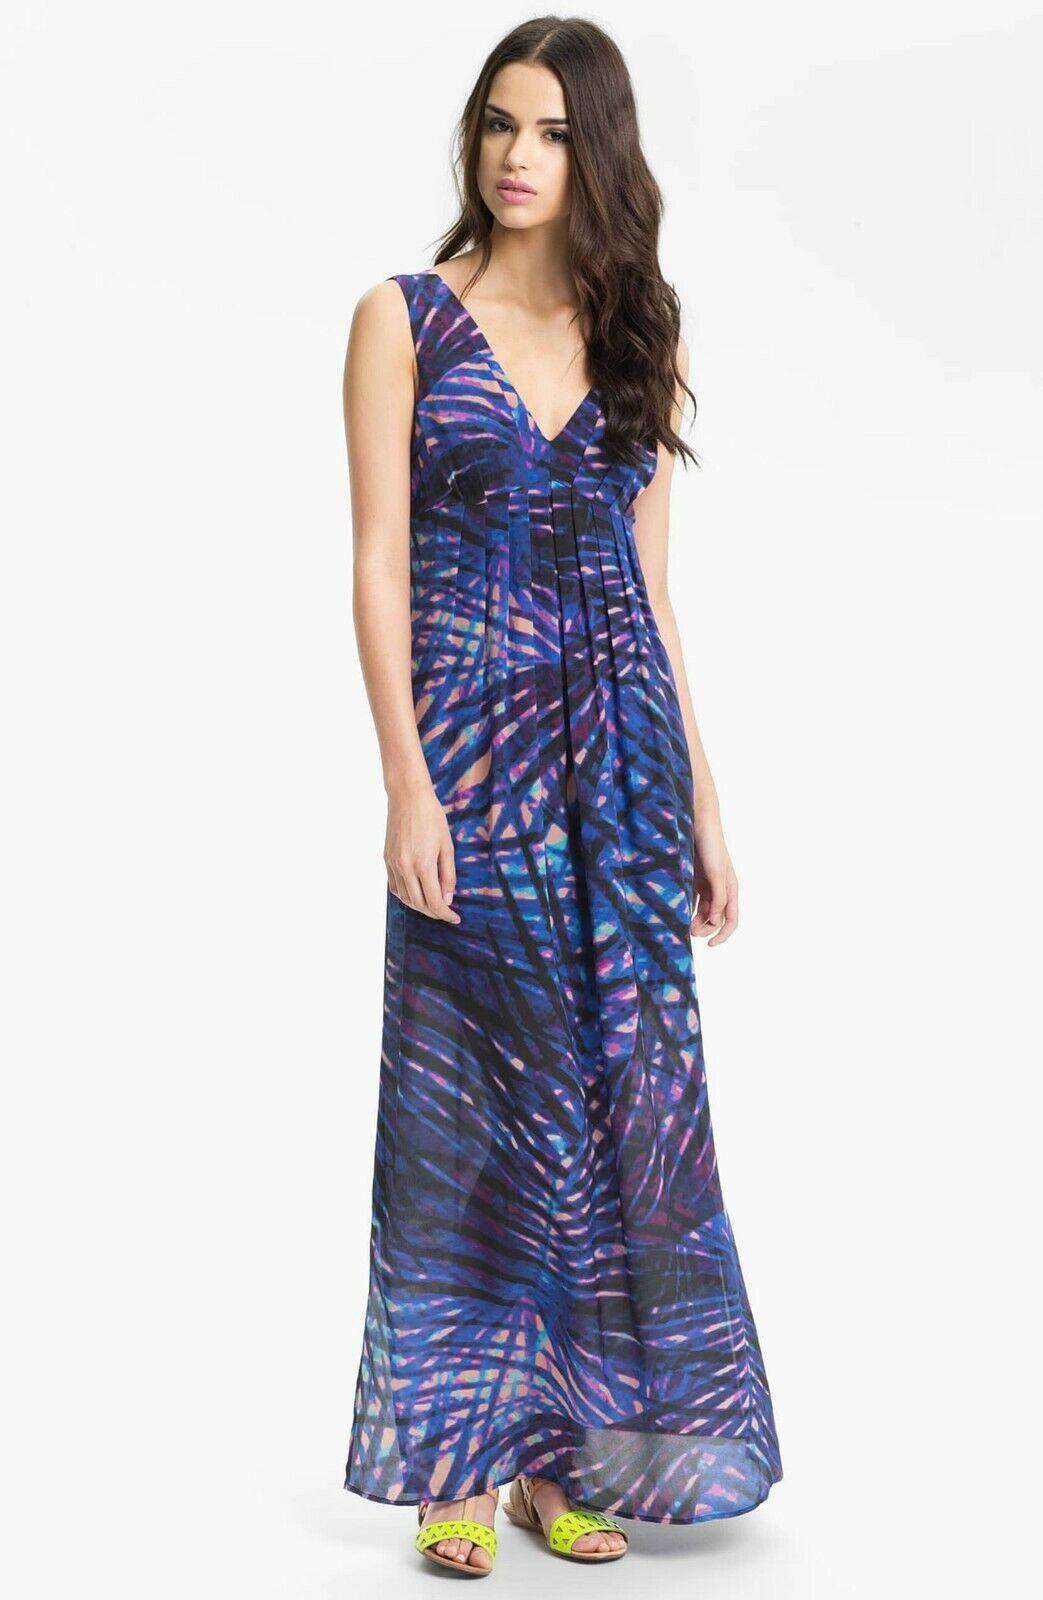 PRESLEY SKYE Print Silk Maxi Dress Blau Empire Waist Pleated Sleeveless S Lined